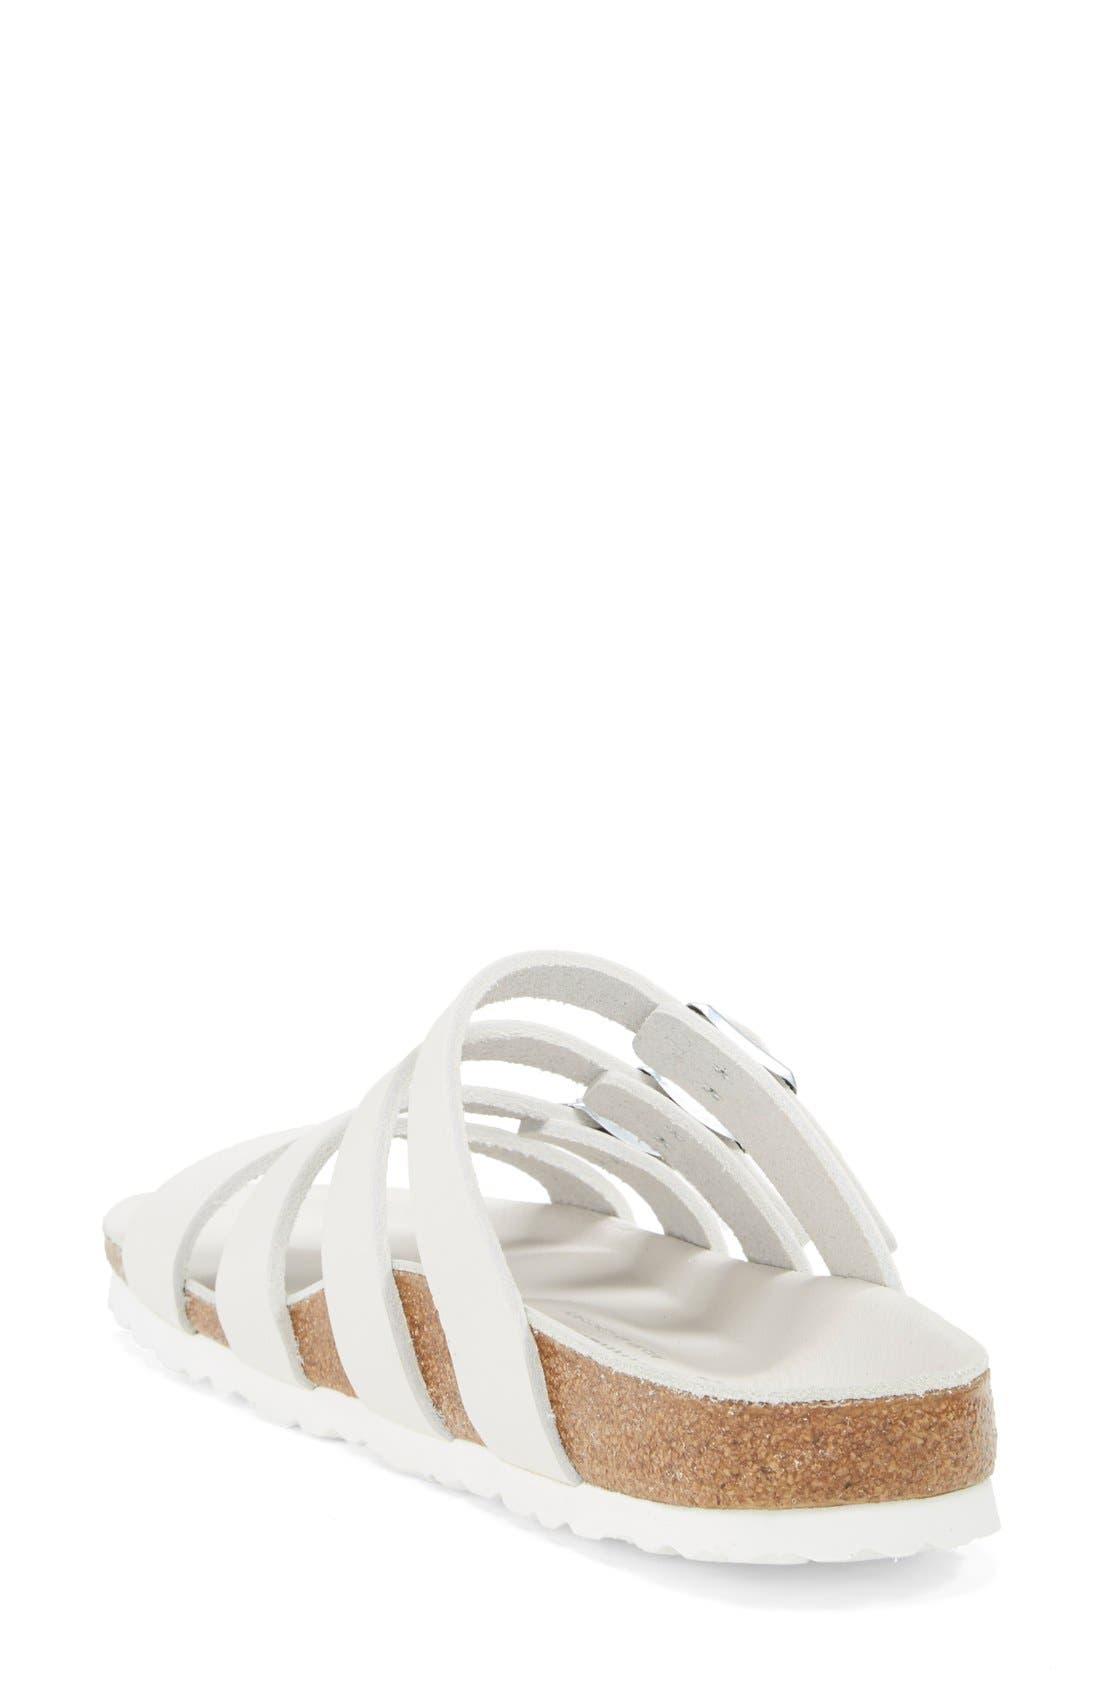 Alternate Image 2  - Birkenstock 'Delmas' Leather Sandal (Women)